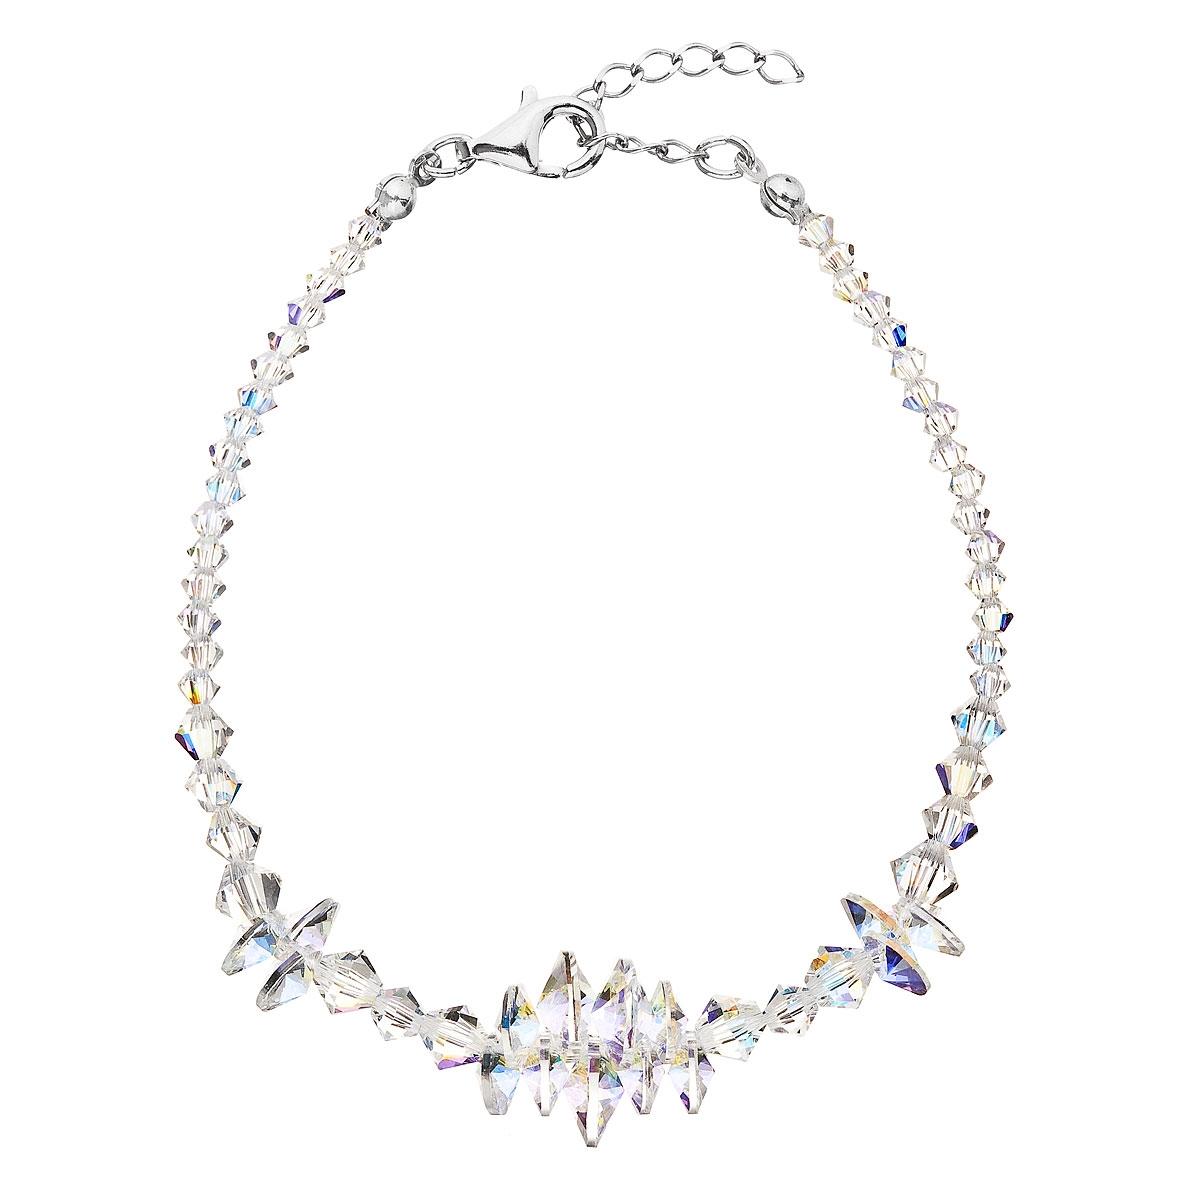 Stříbrný náramek s krystaly Crystals from Swarovski® AB EG7048-AB